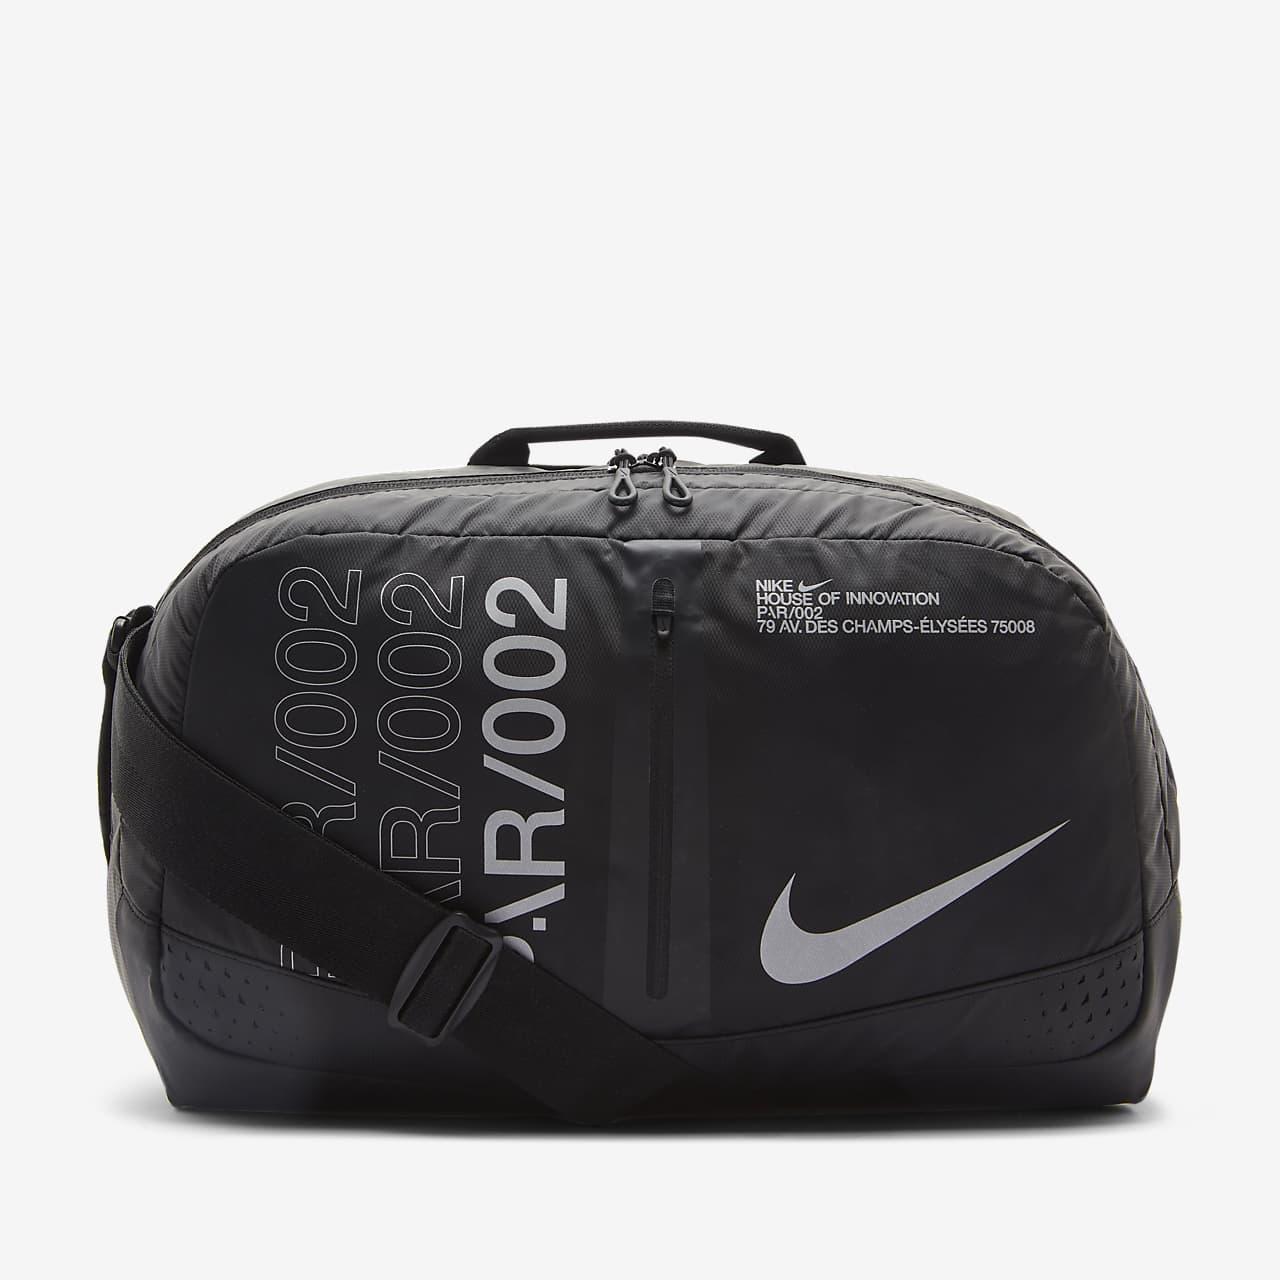 Nike Run House of Innovation (Paris) Duffel Bag